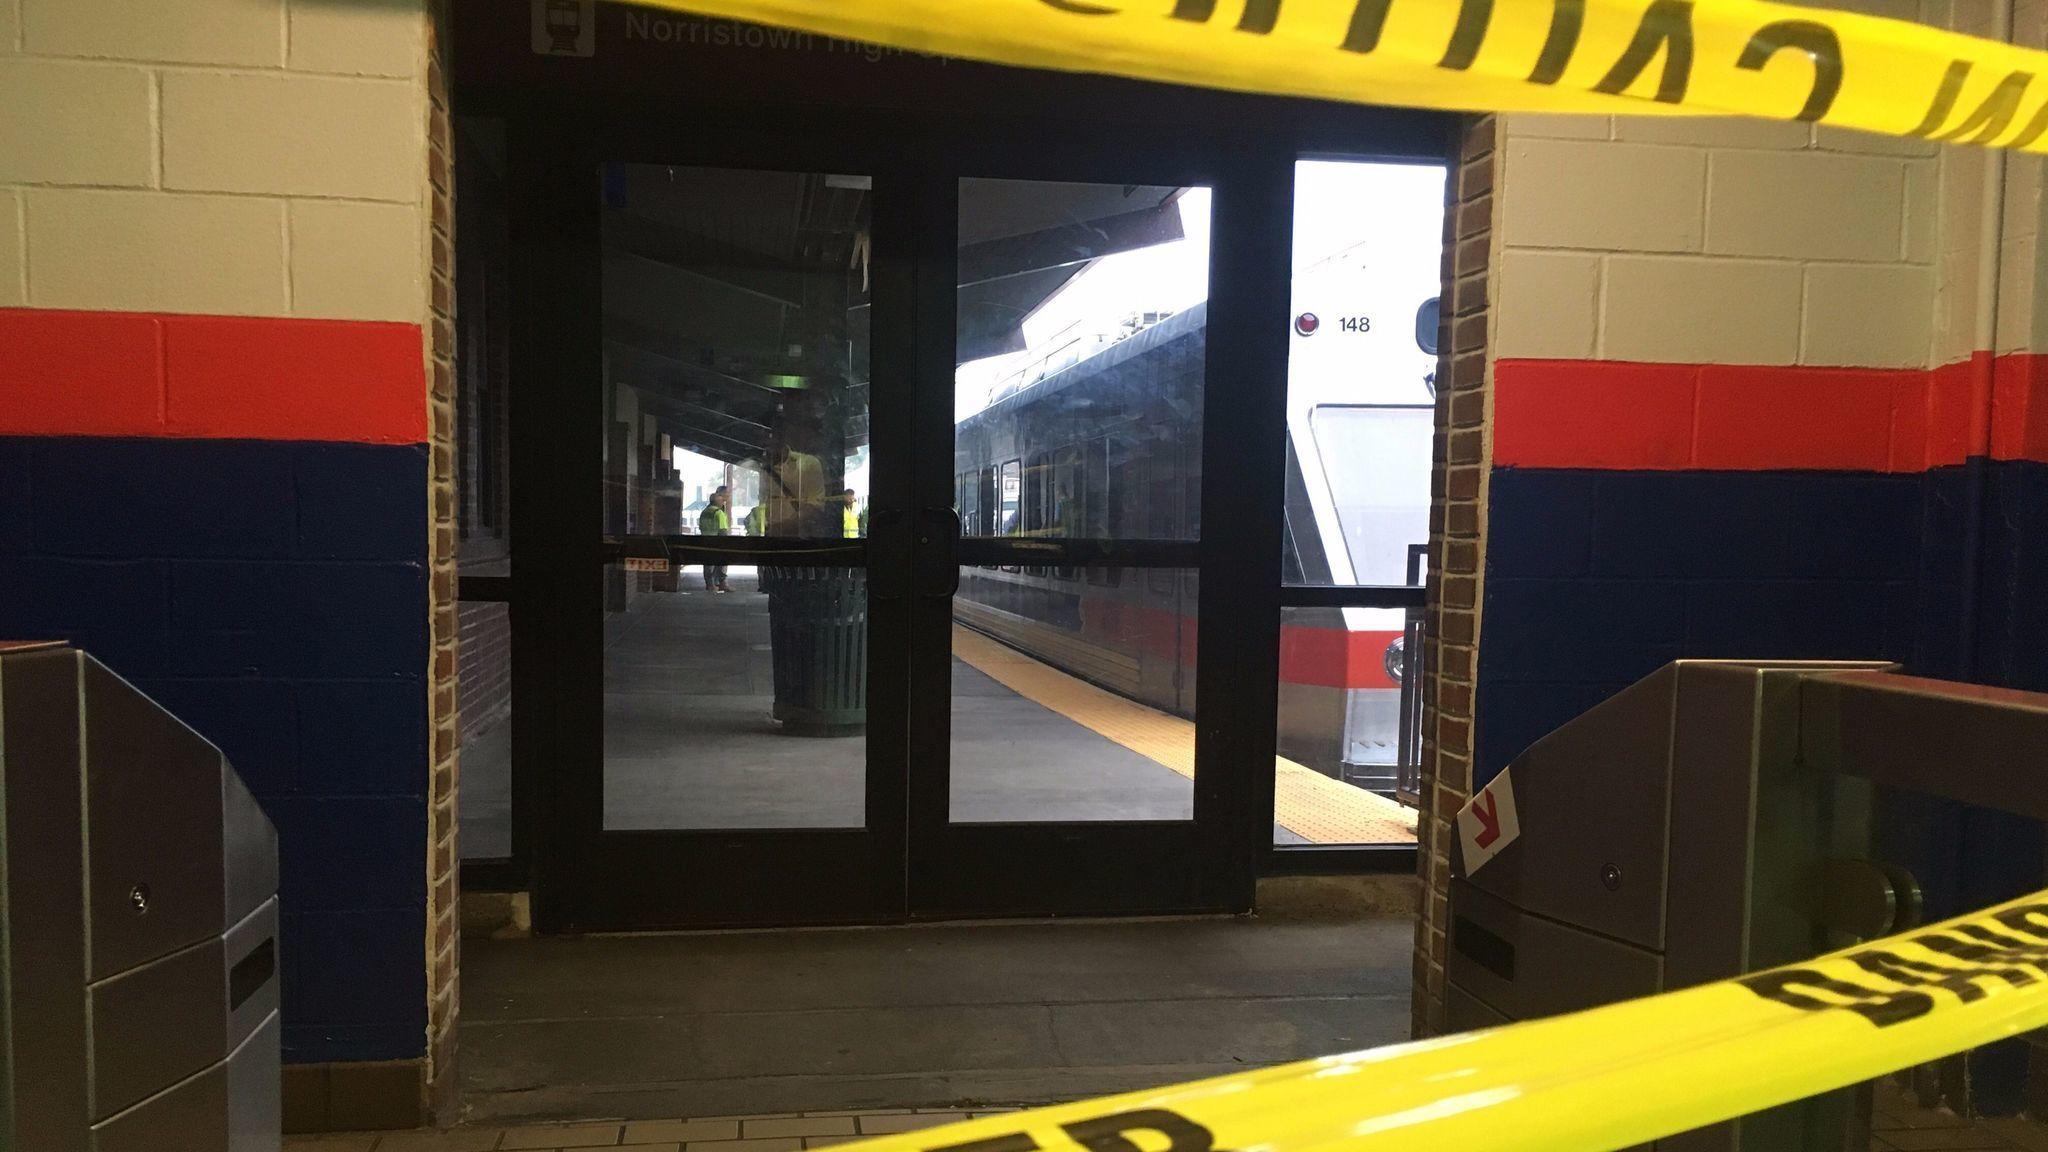 Train crashes in Philadelphia, injuring 42